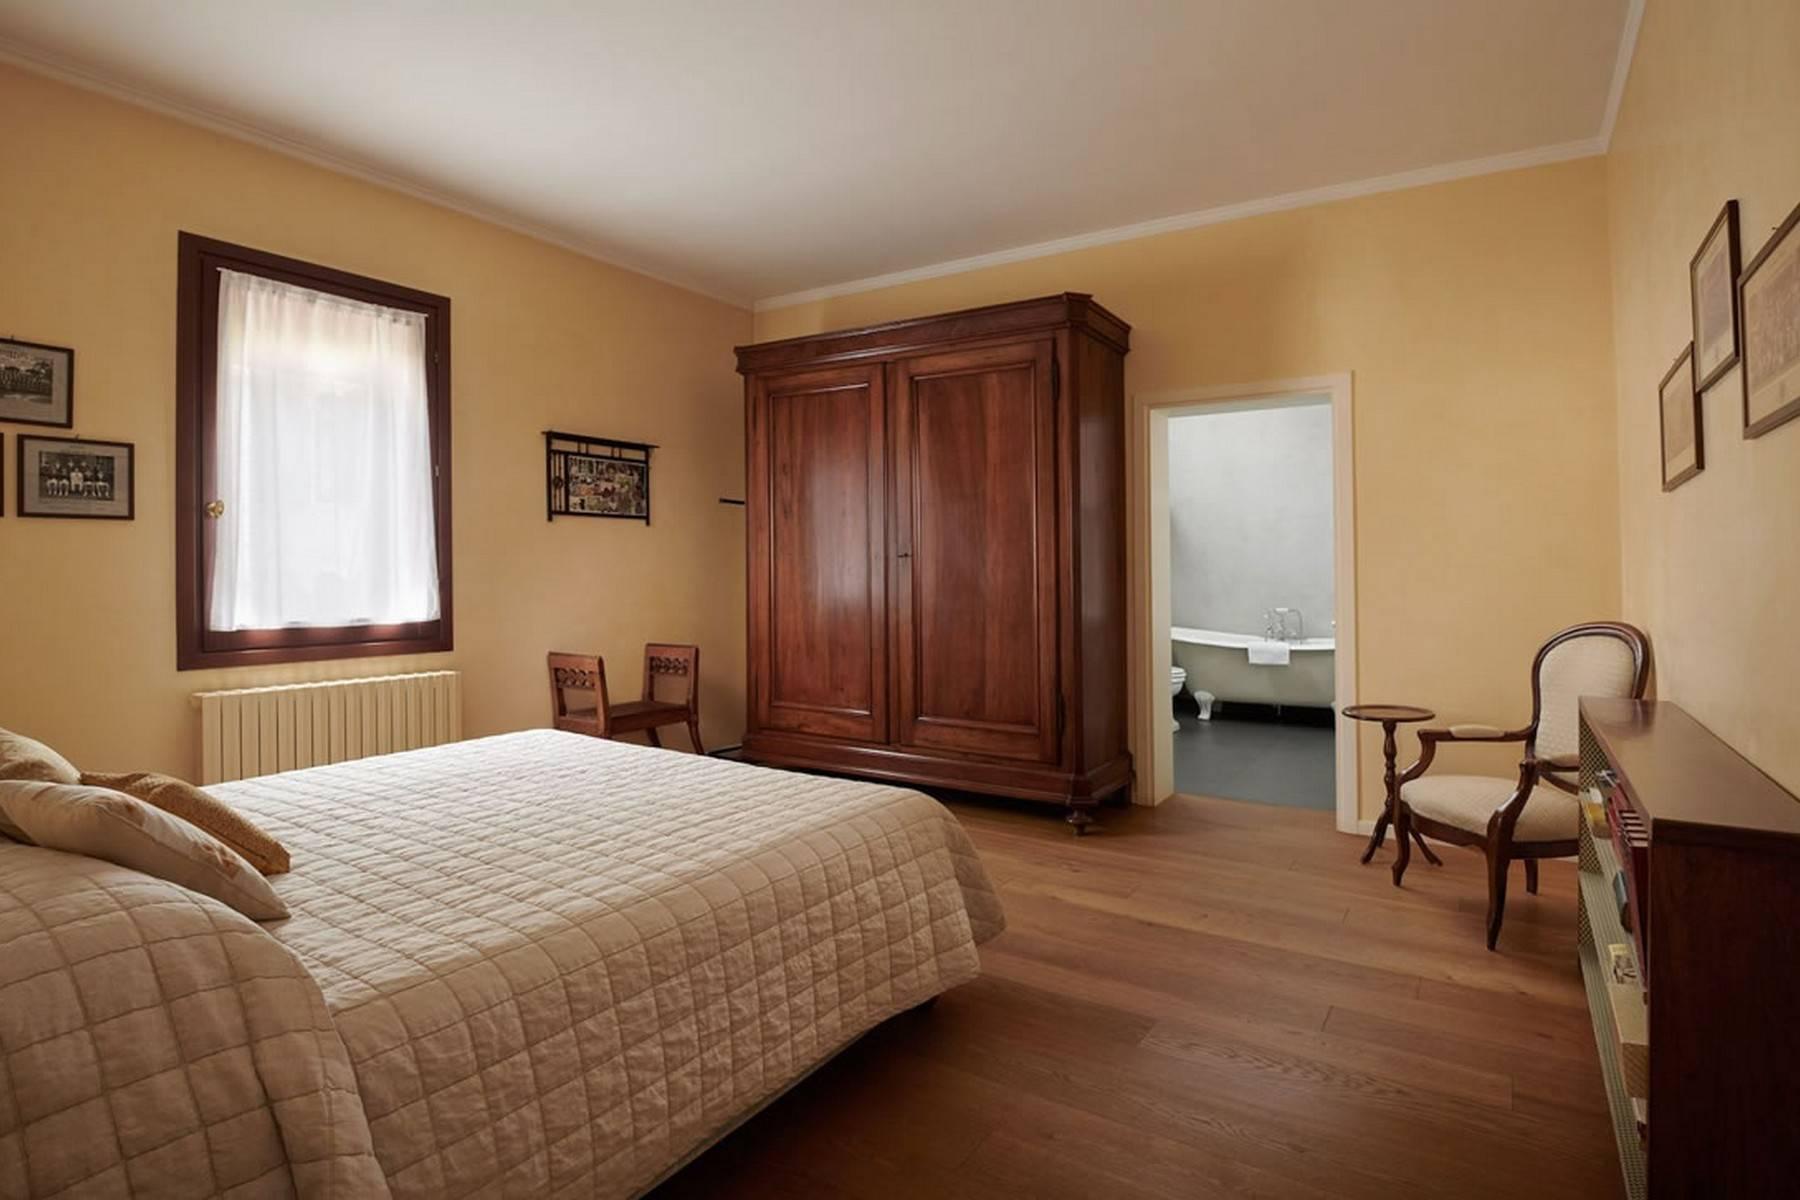 Appartement de design dans le Palazzo Querini Stampalia / S.M. Formosa - 19